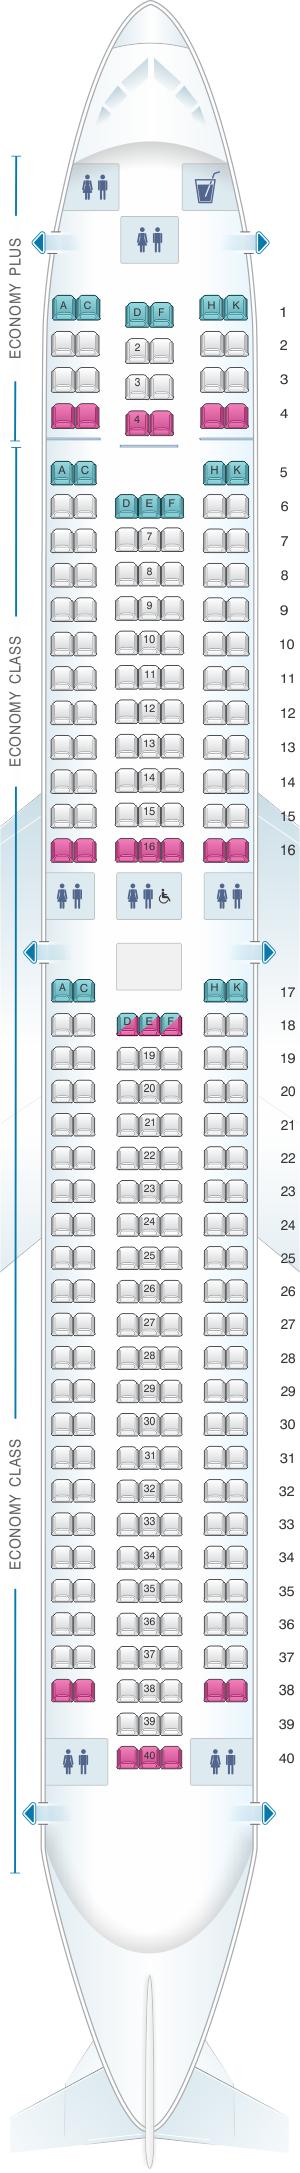 Seat map for WestJet Boeing B767 300